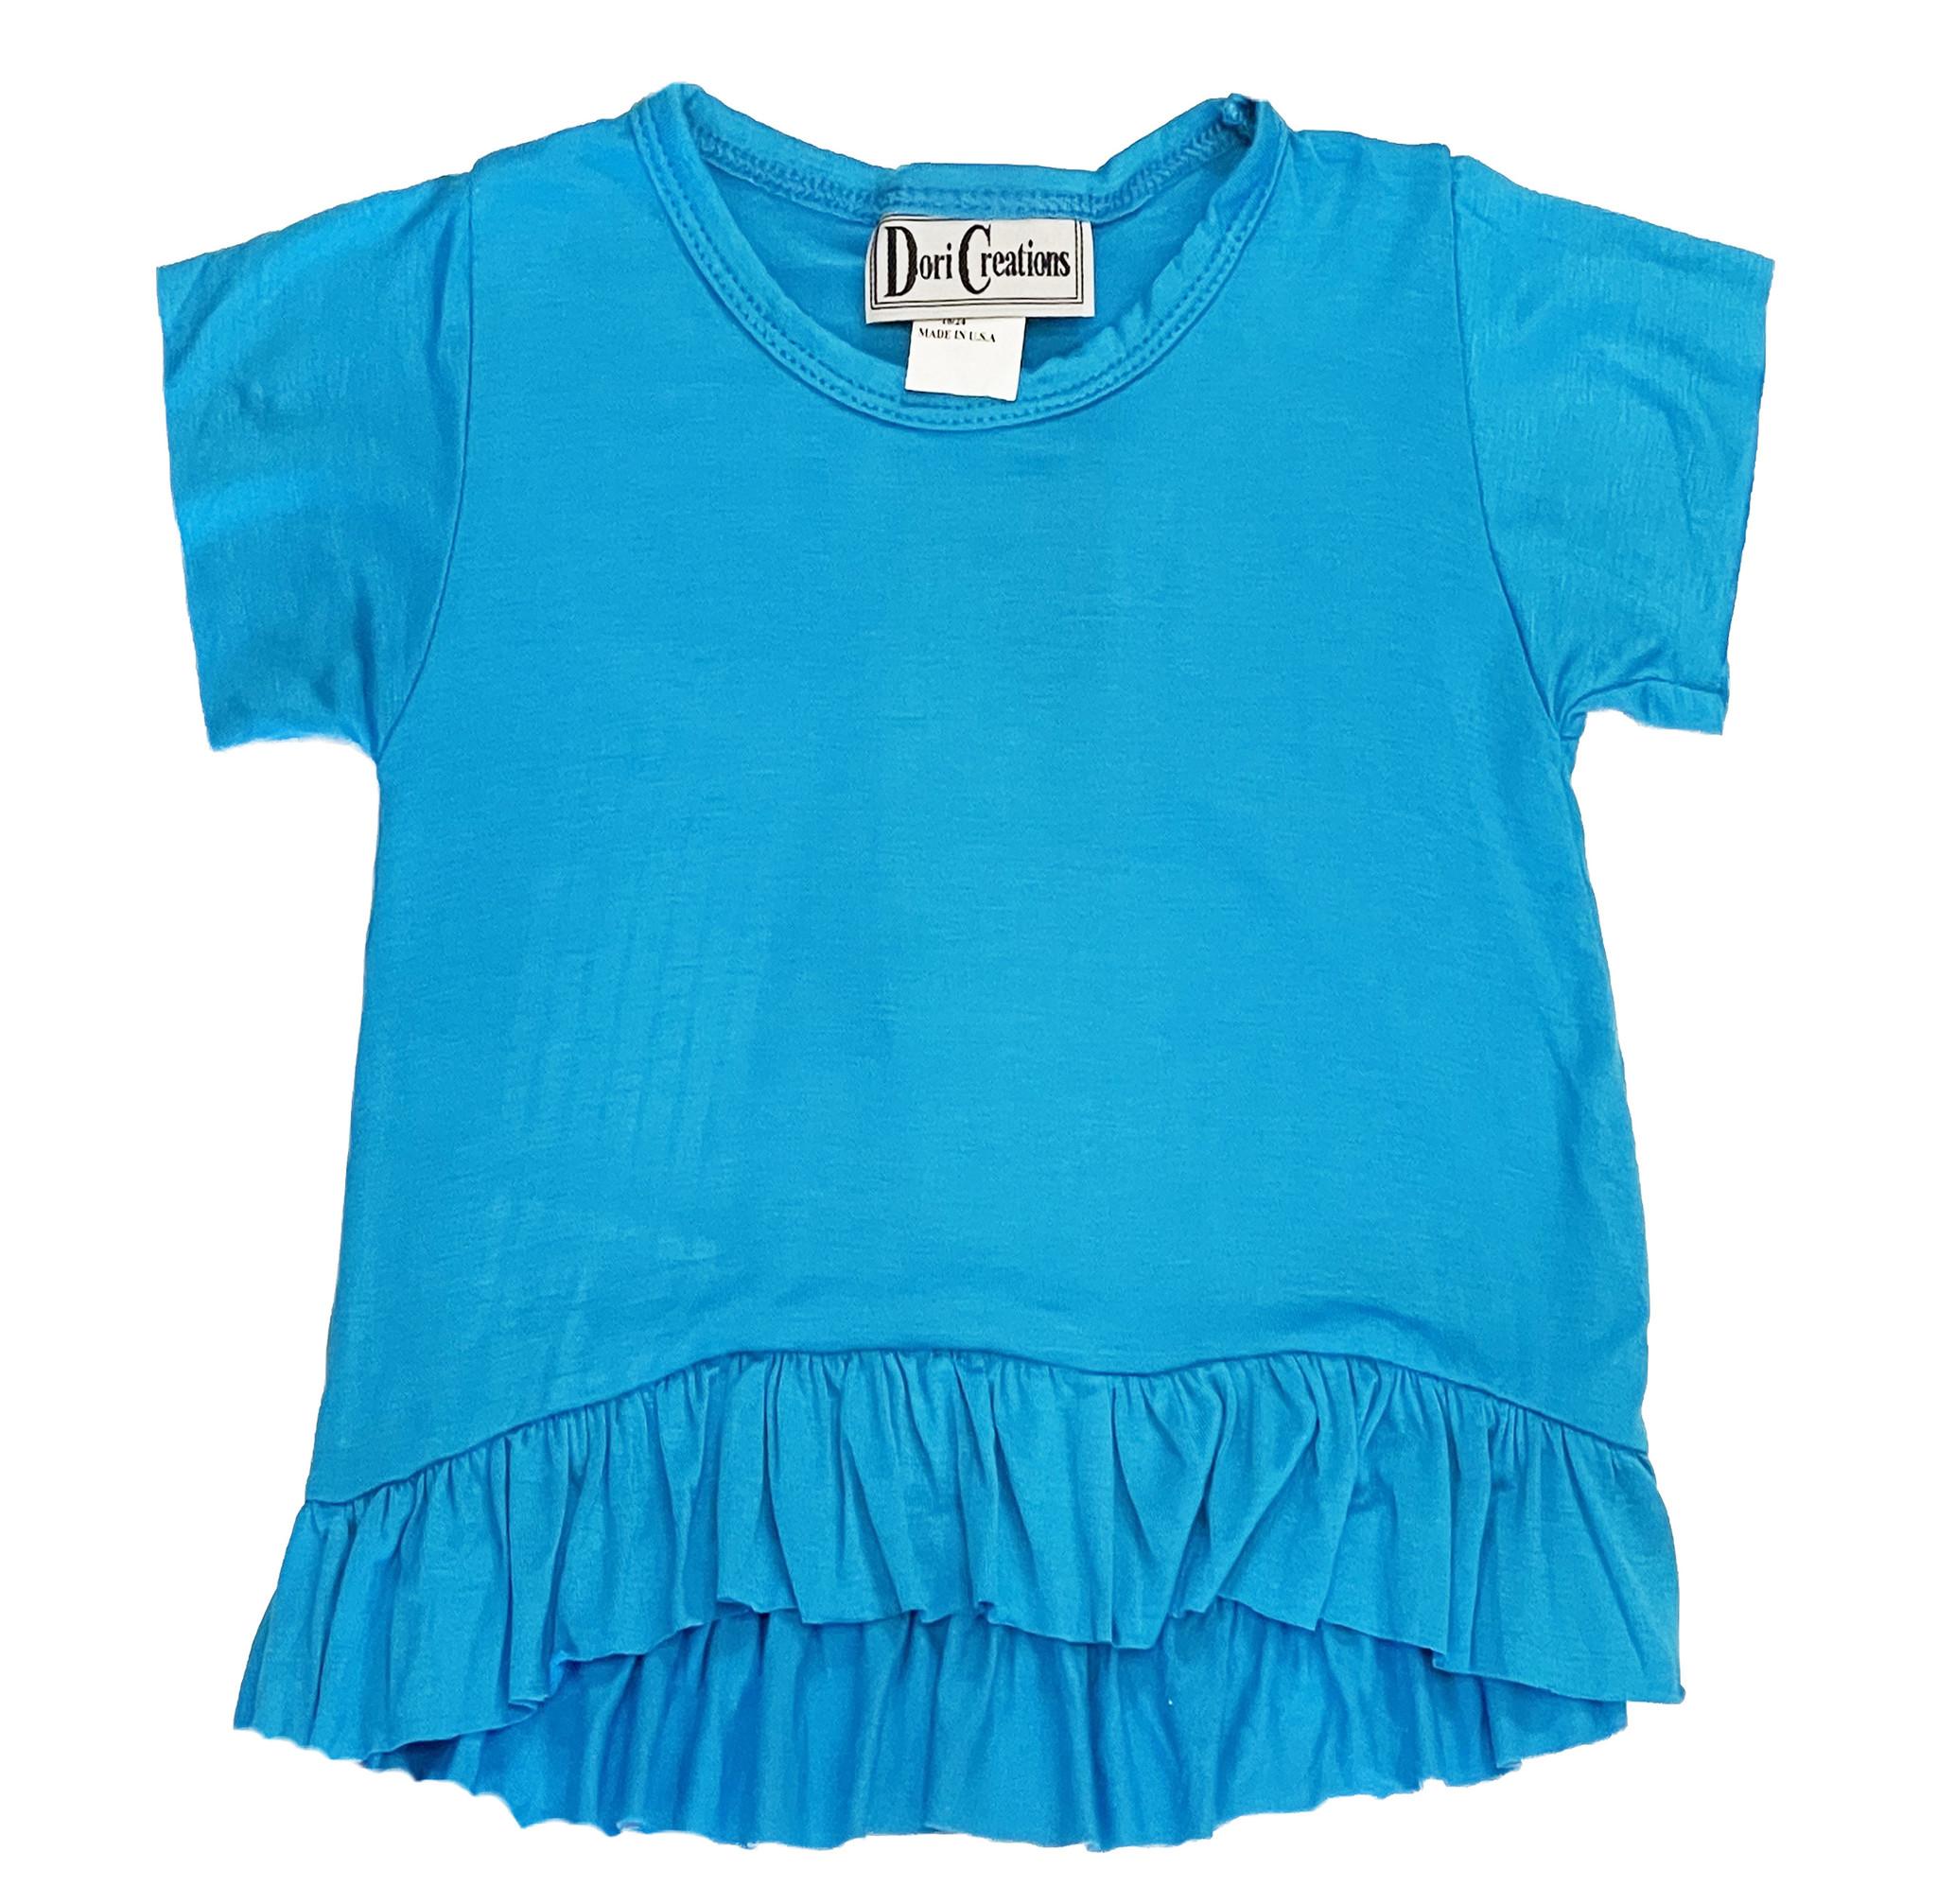 Dori SS Turquoise Ruffle Top